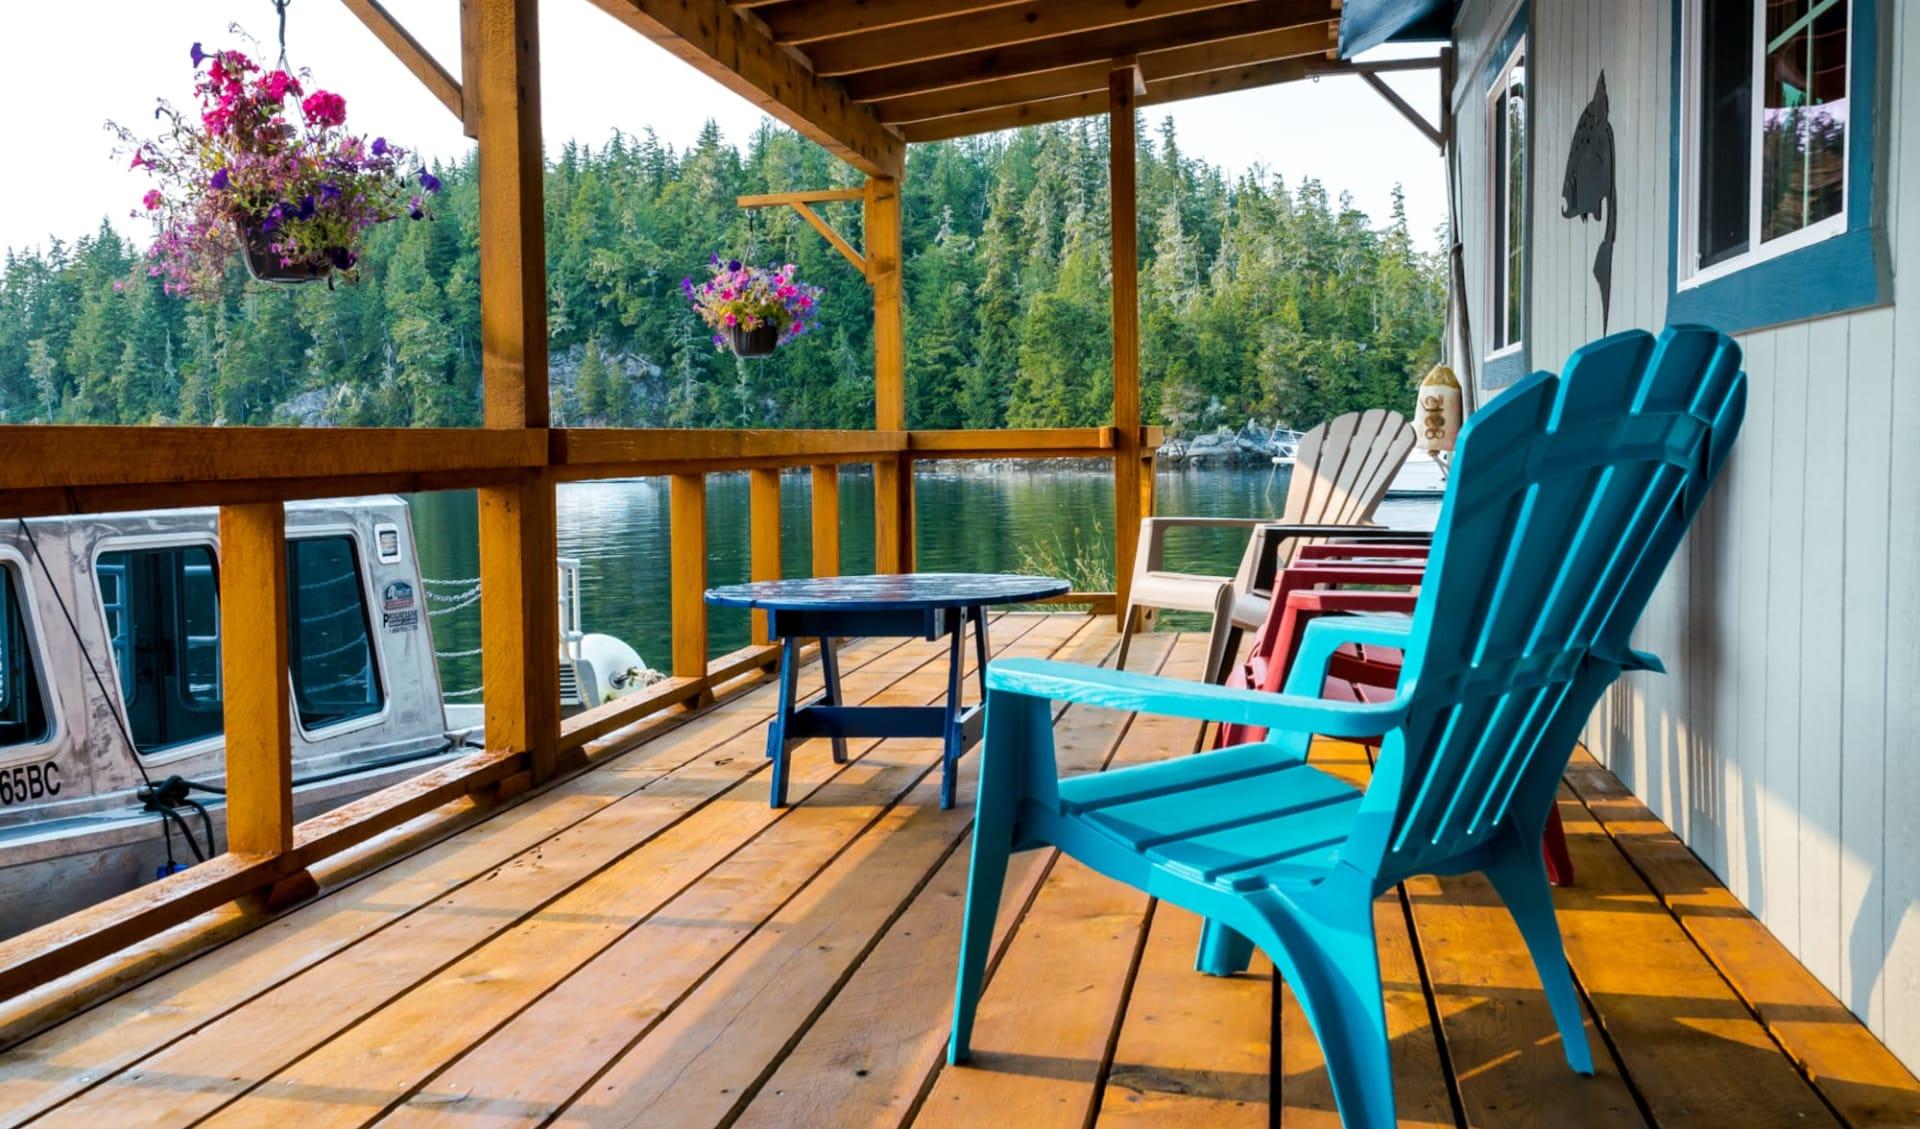 Bärenbeobachtung Farewell Lodge ab Vancouver Island: exterior: Farwell Lodge - Hotelveranda